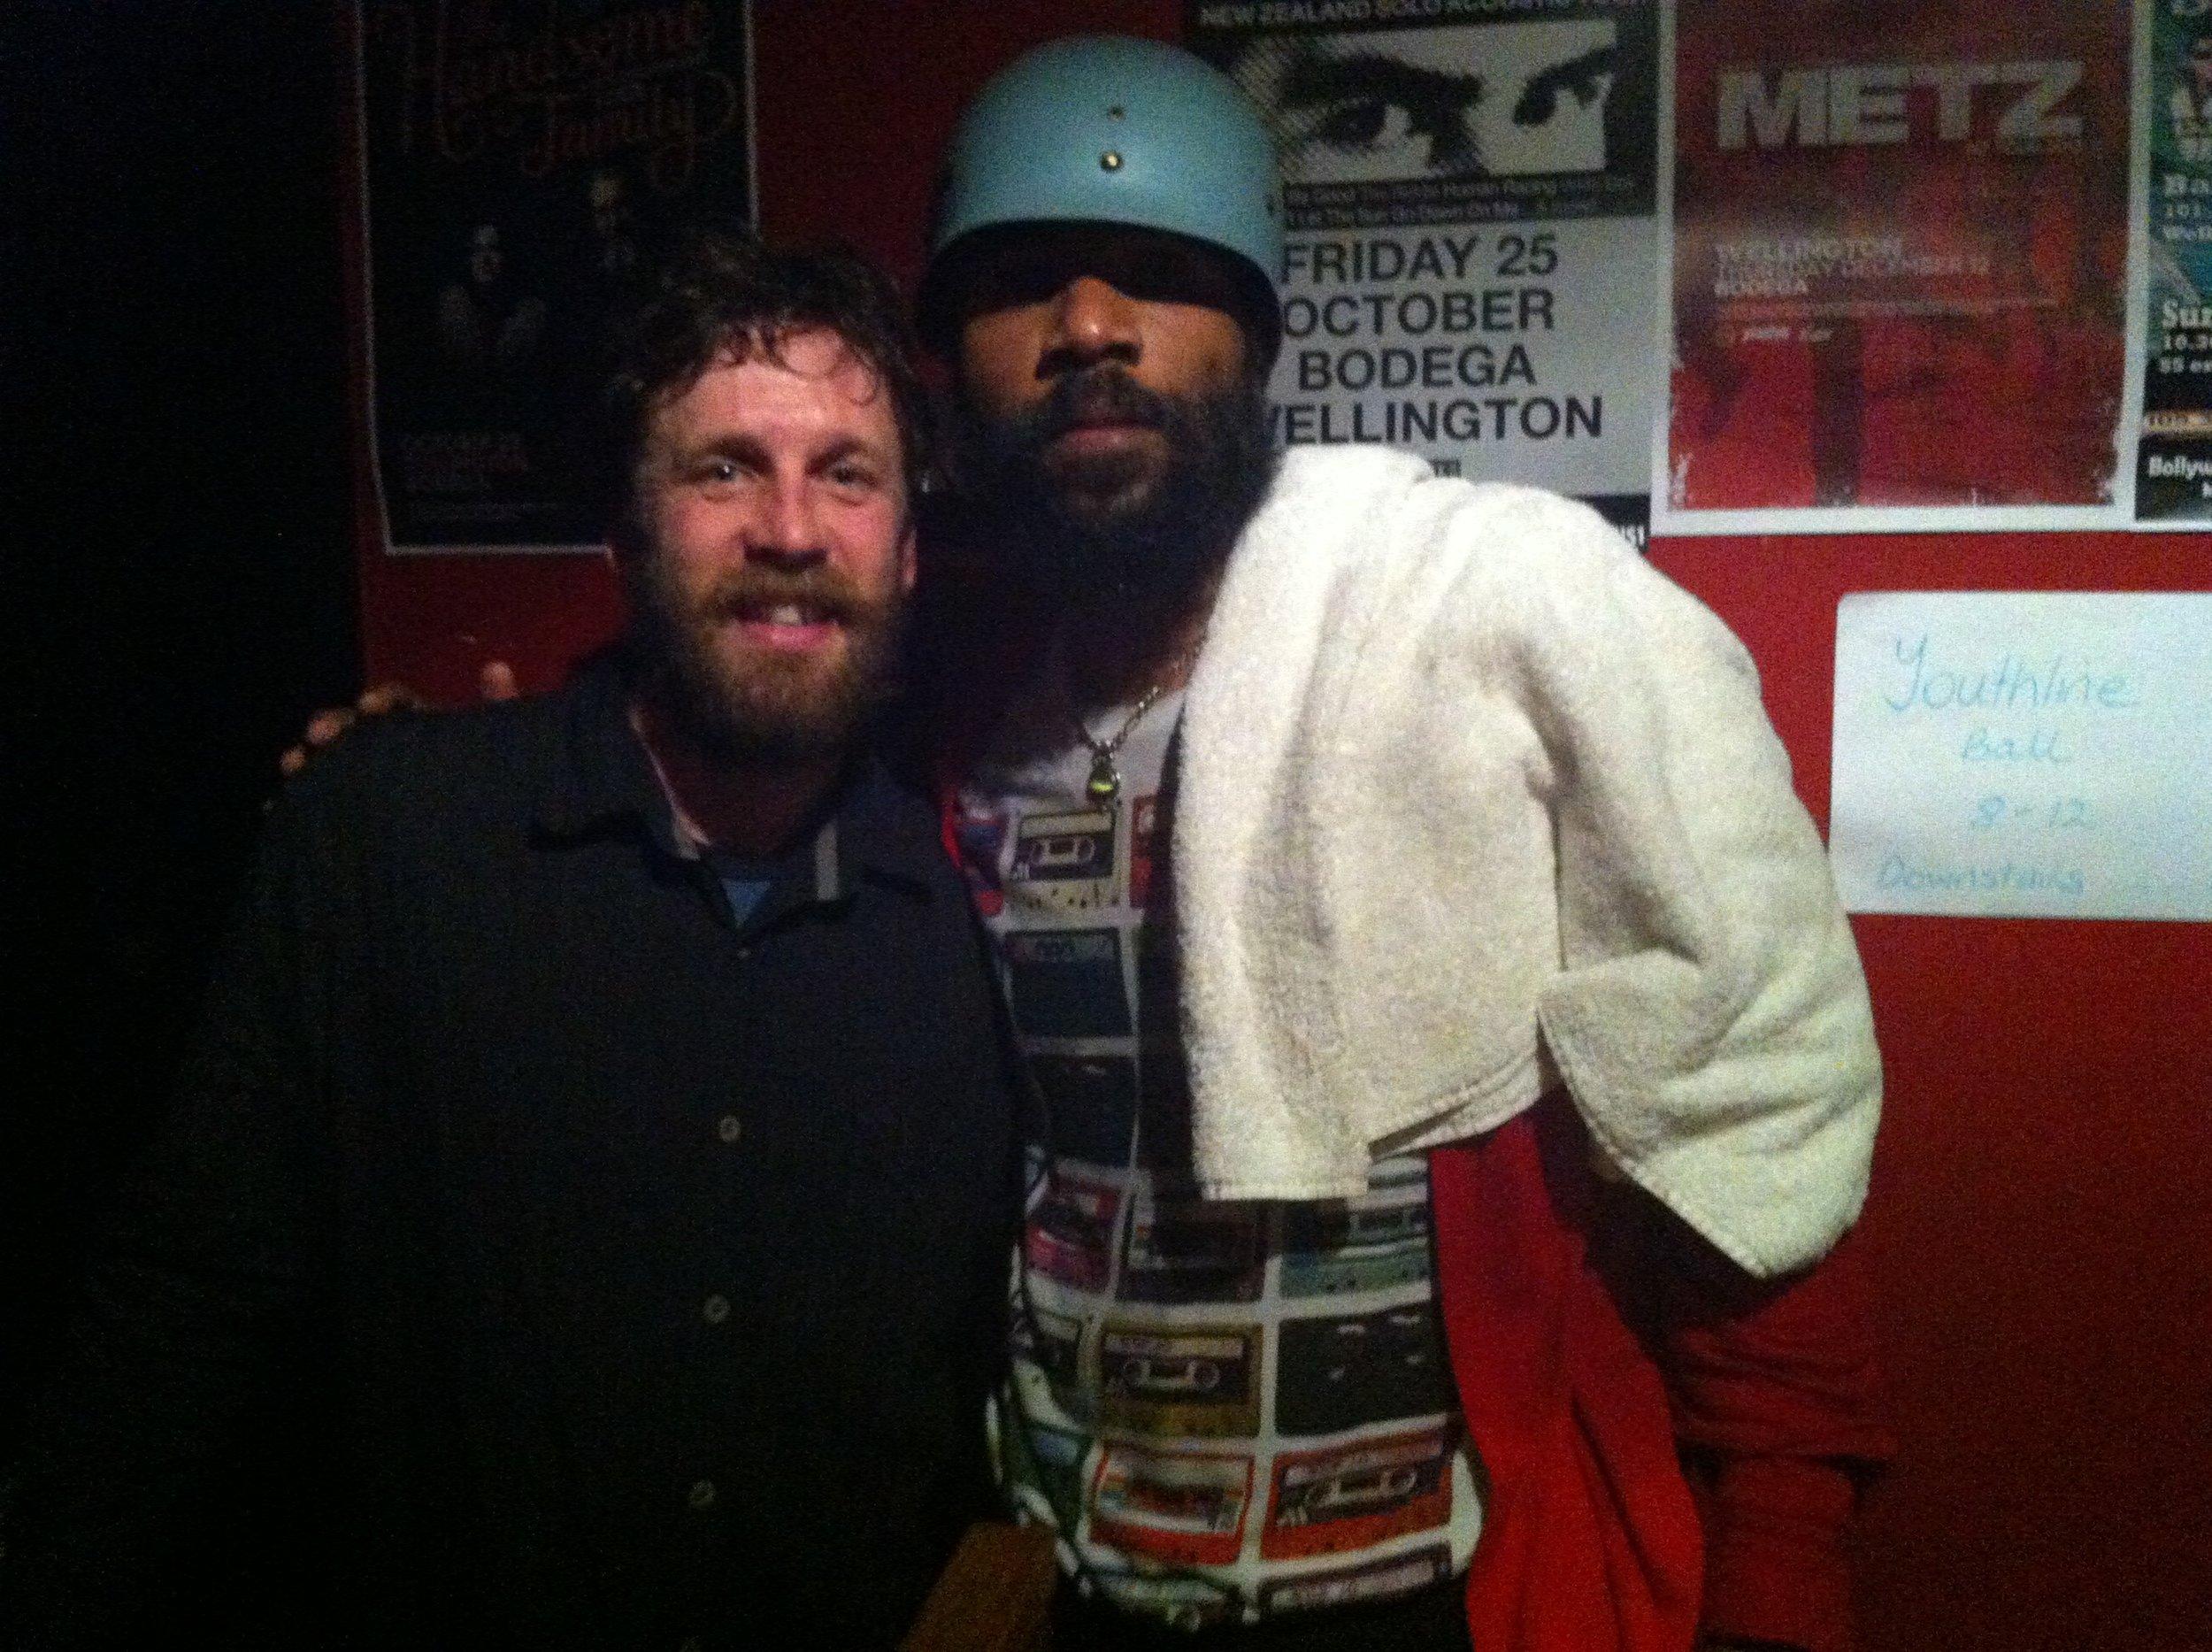 Cody and me. Wellington 2013